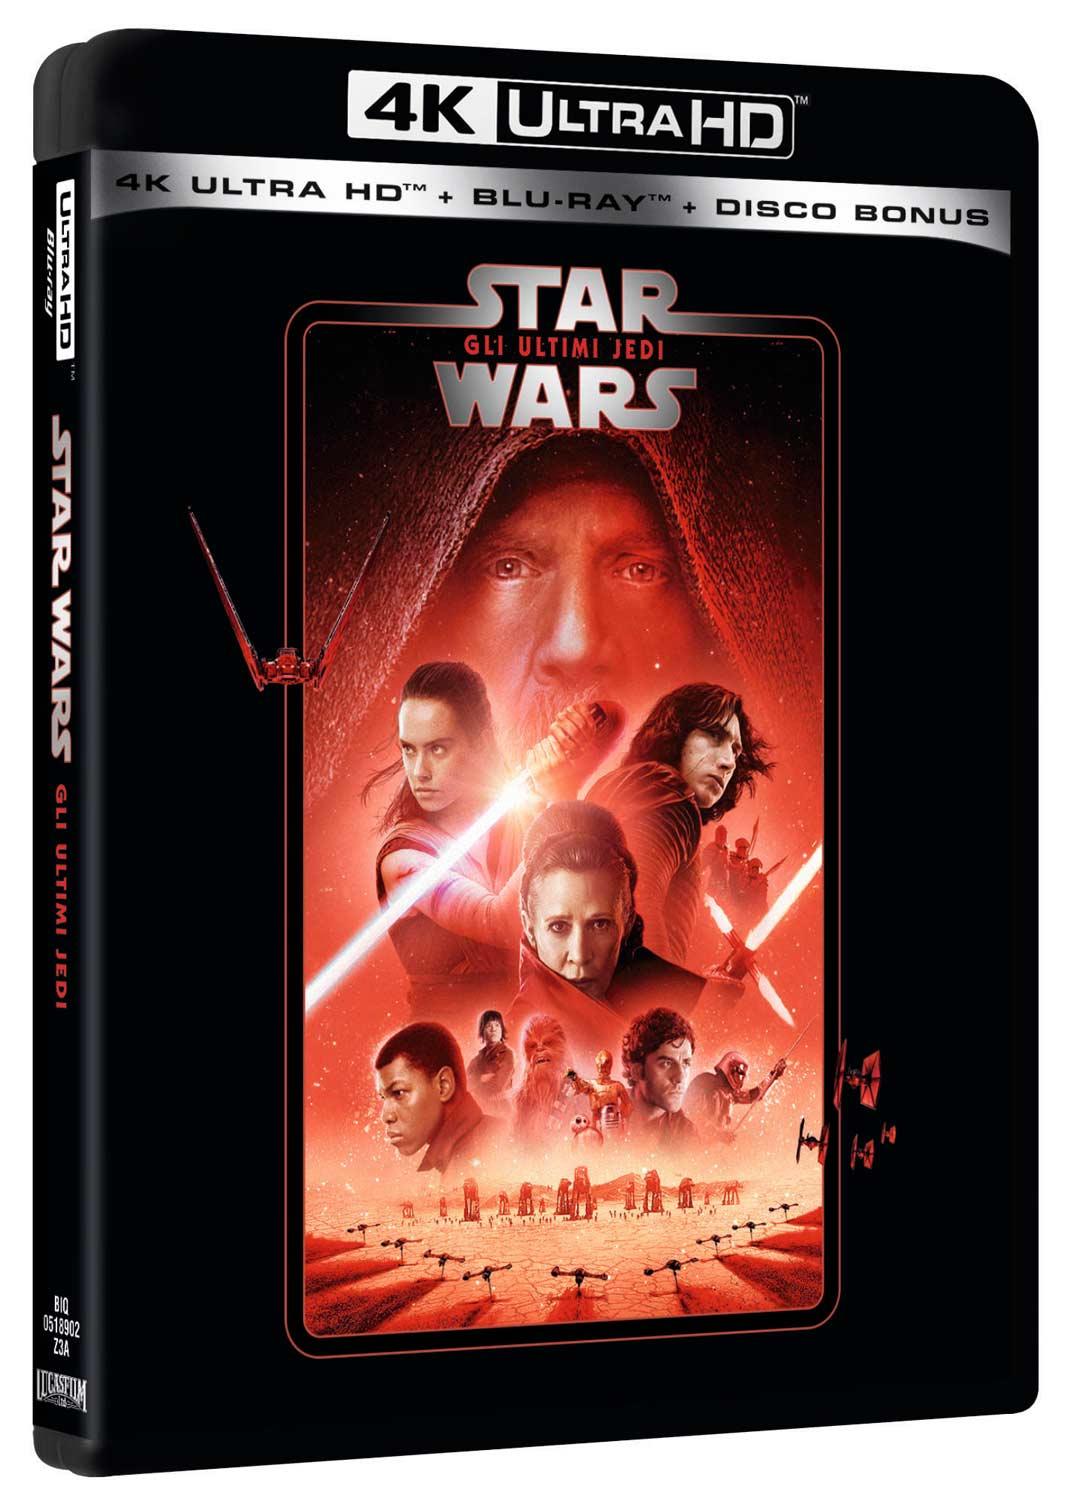 STAR WARS - EPISODIO VIII - GLI ULTIMI JEDI (BLU-RAY 4K ULTRA HD